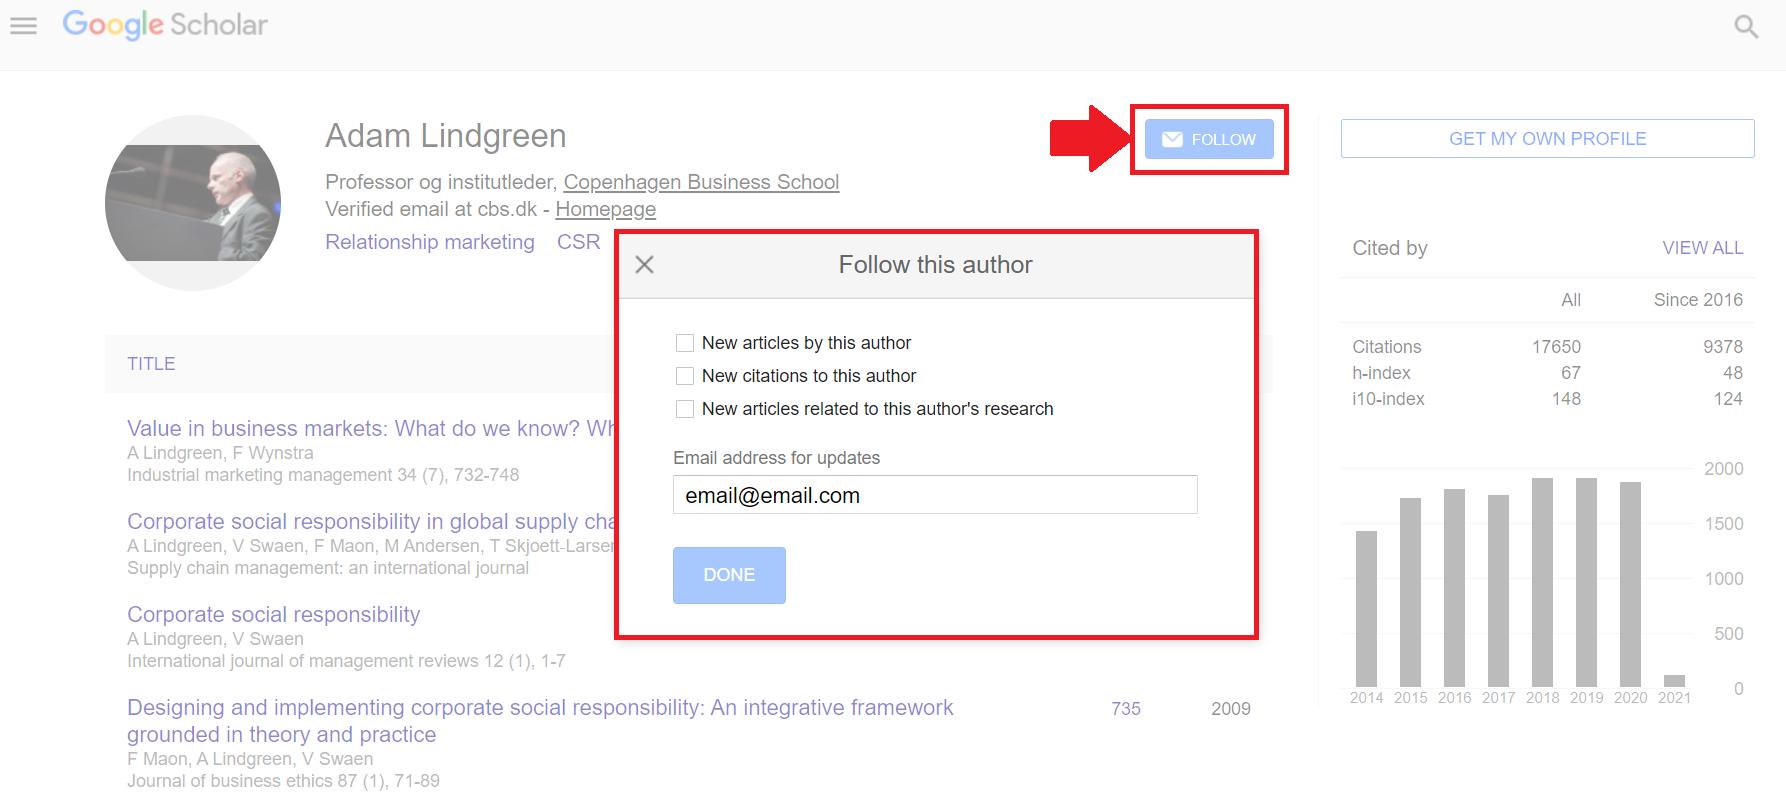 Follow an author in Google Scholar